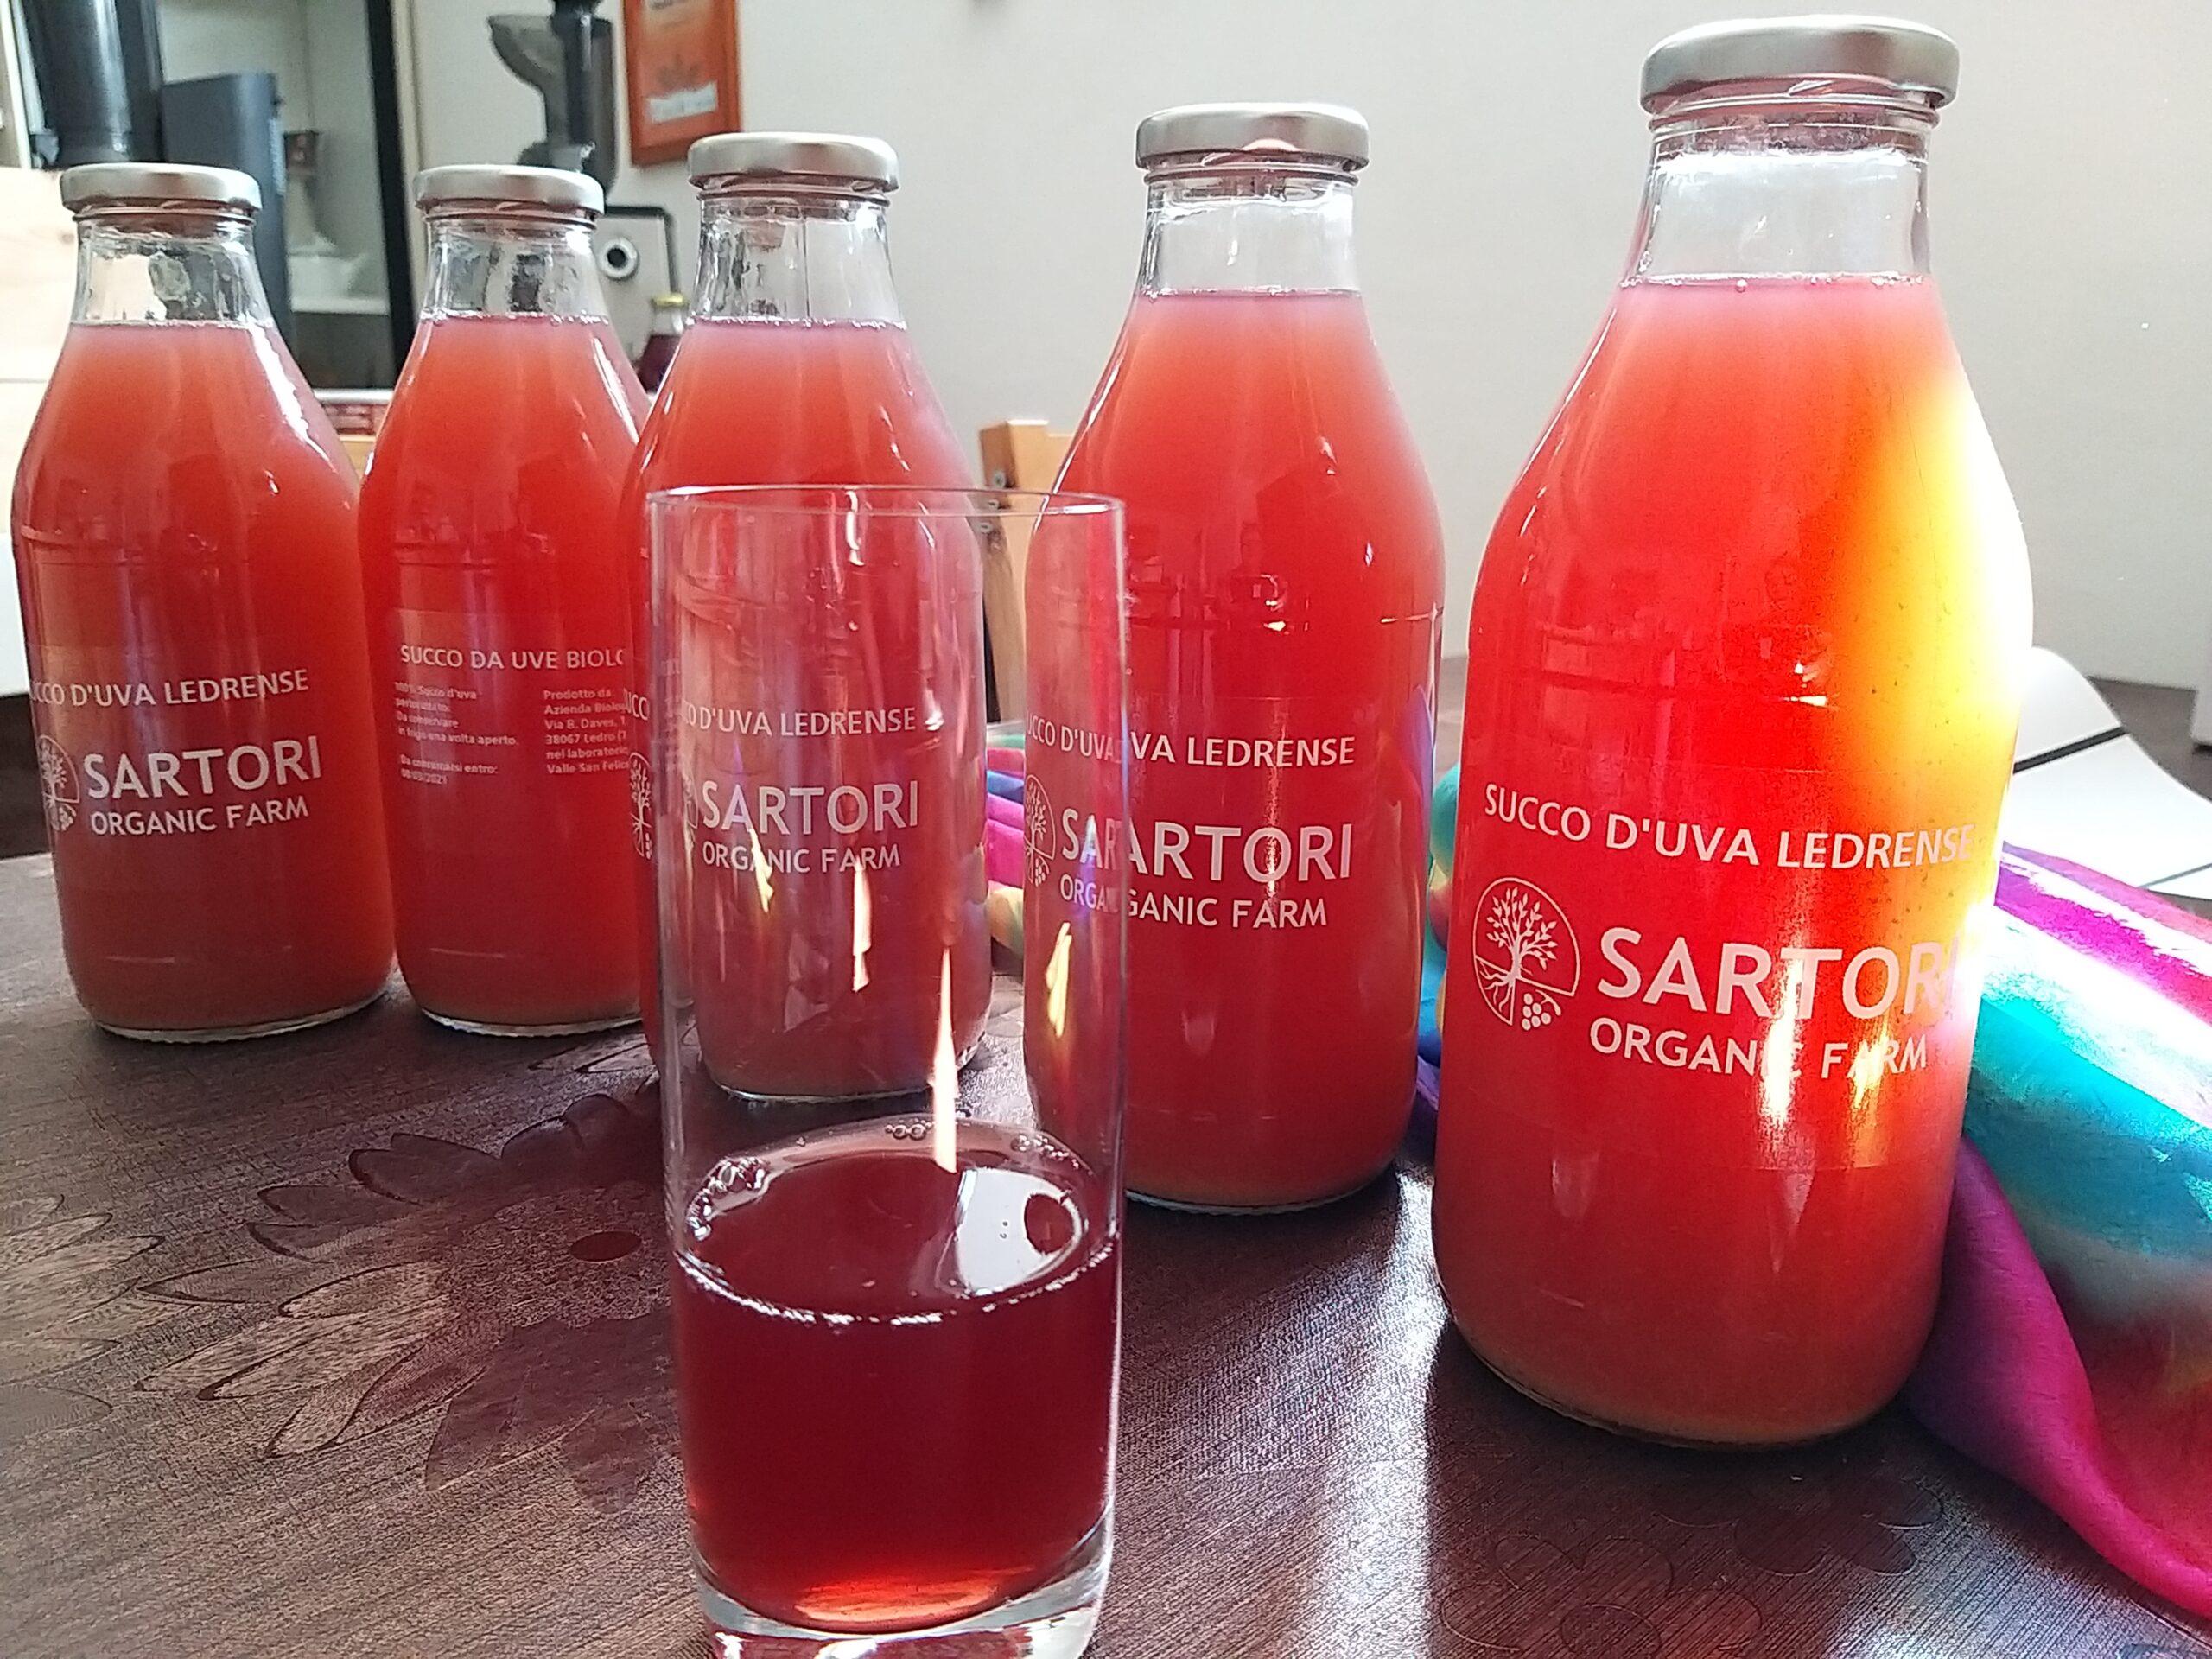 Wines And Juice Sartori Organic Farm